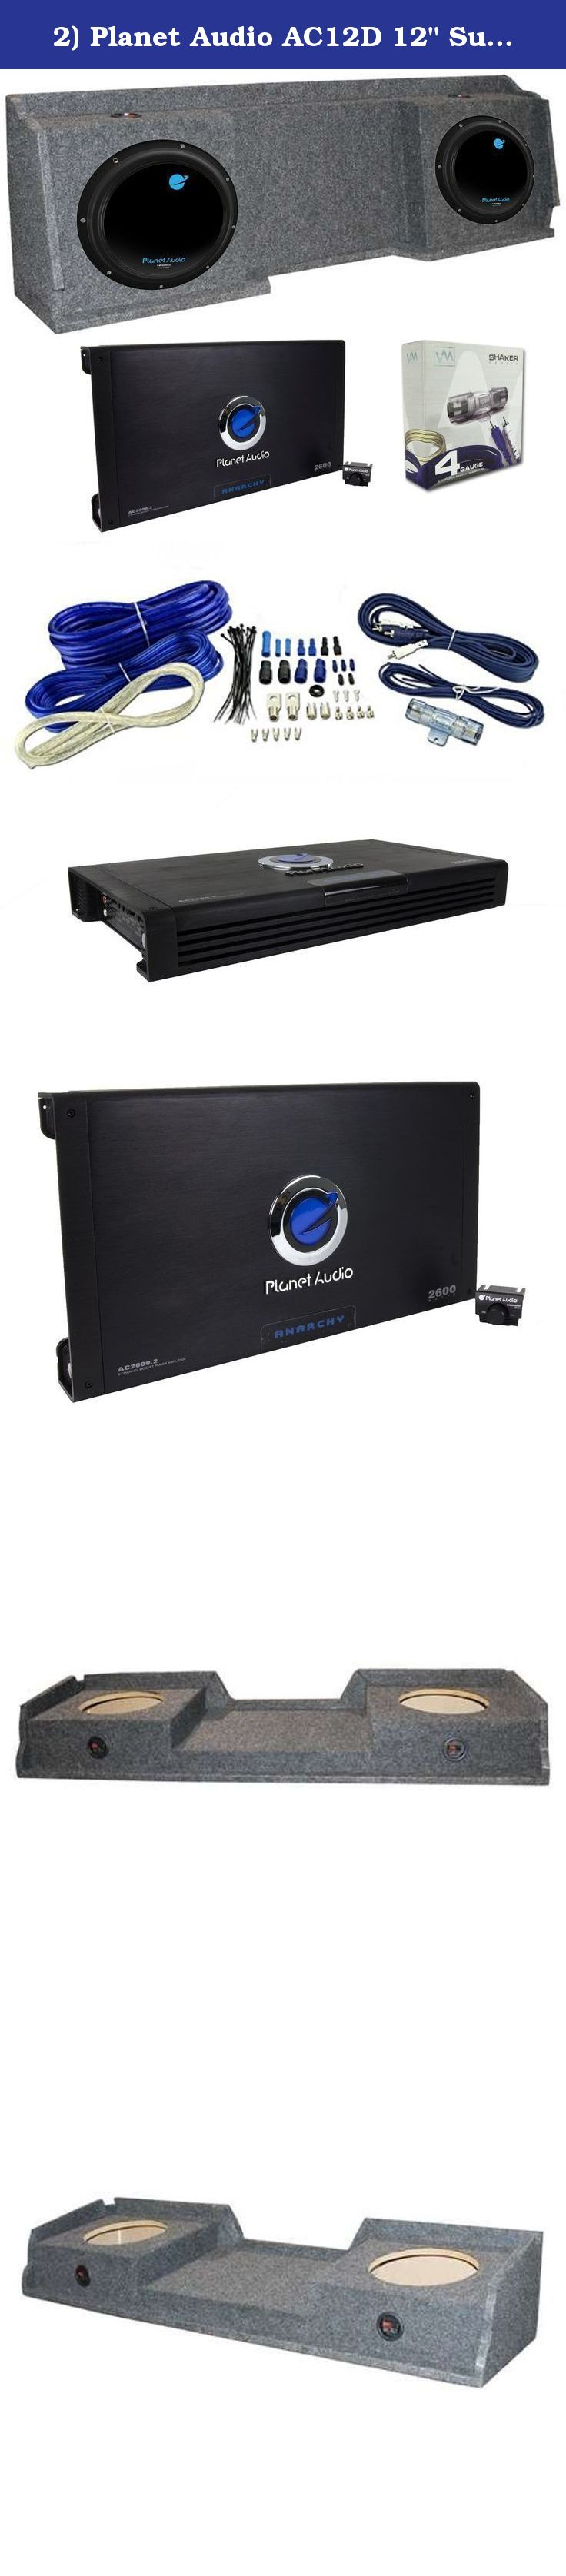 "Planet Audio AC12D 12/"" 3600W Subs 2 GMC Chevy Silverado Ext Cab /'99-06 Box"